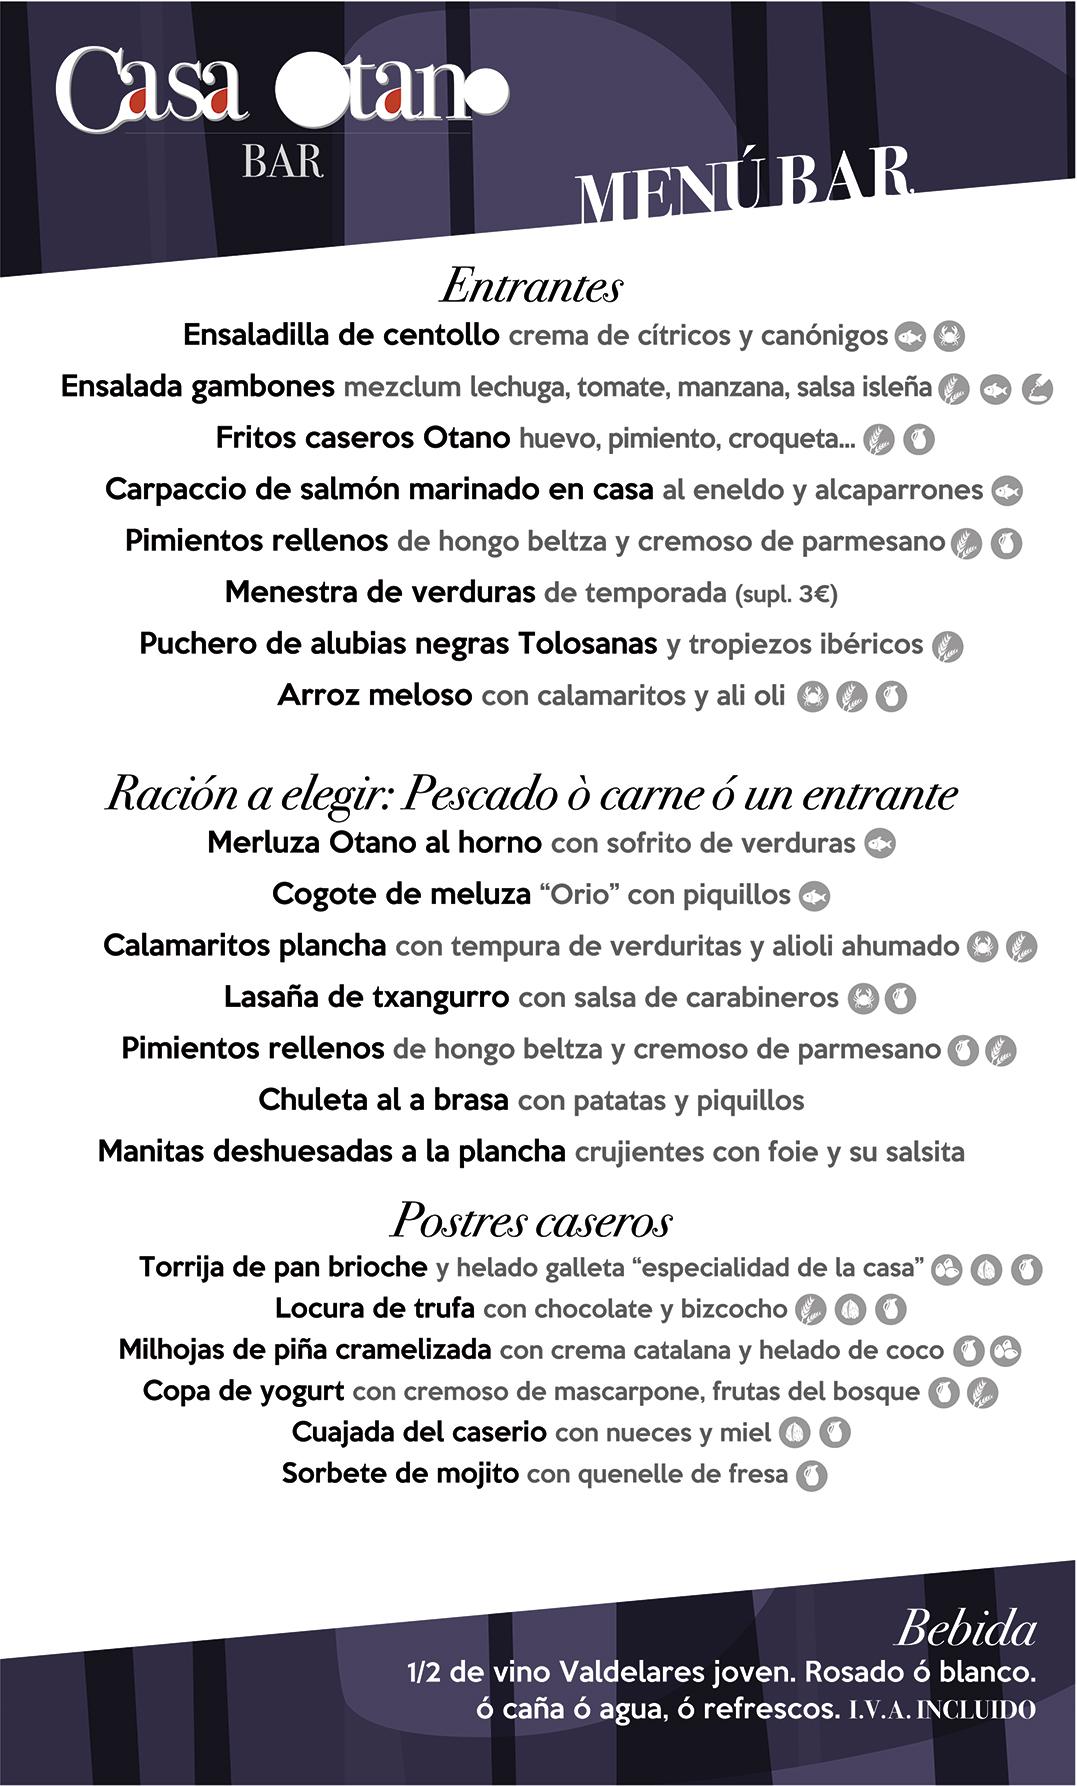 menu bar 2020